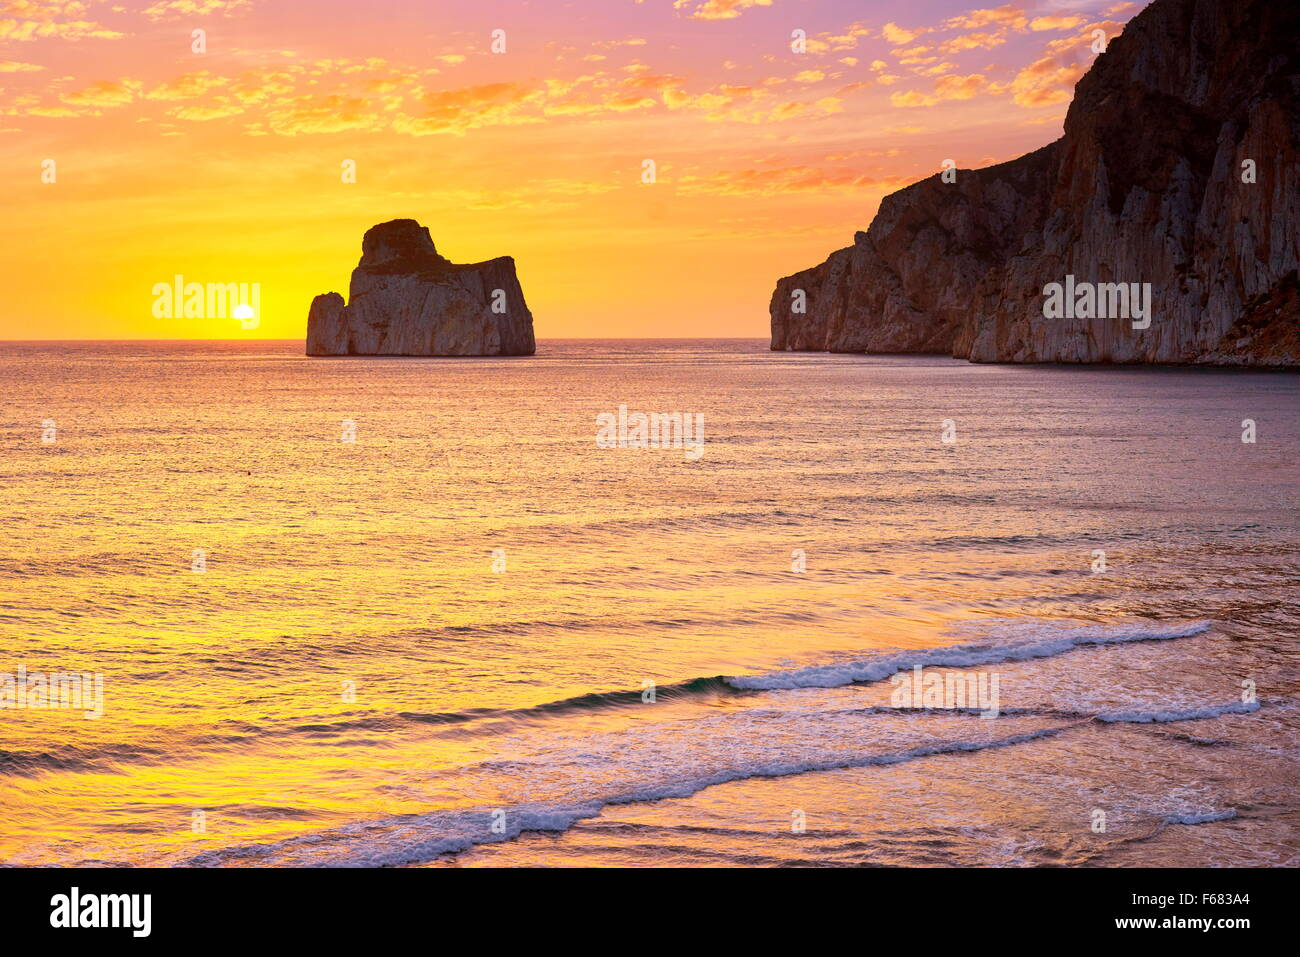 Pan di Zucchero at sunset time, Masua Village, Sardinia Island, Italy - Stock Image